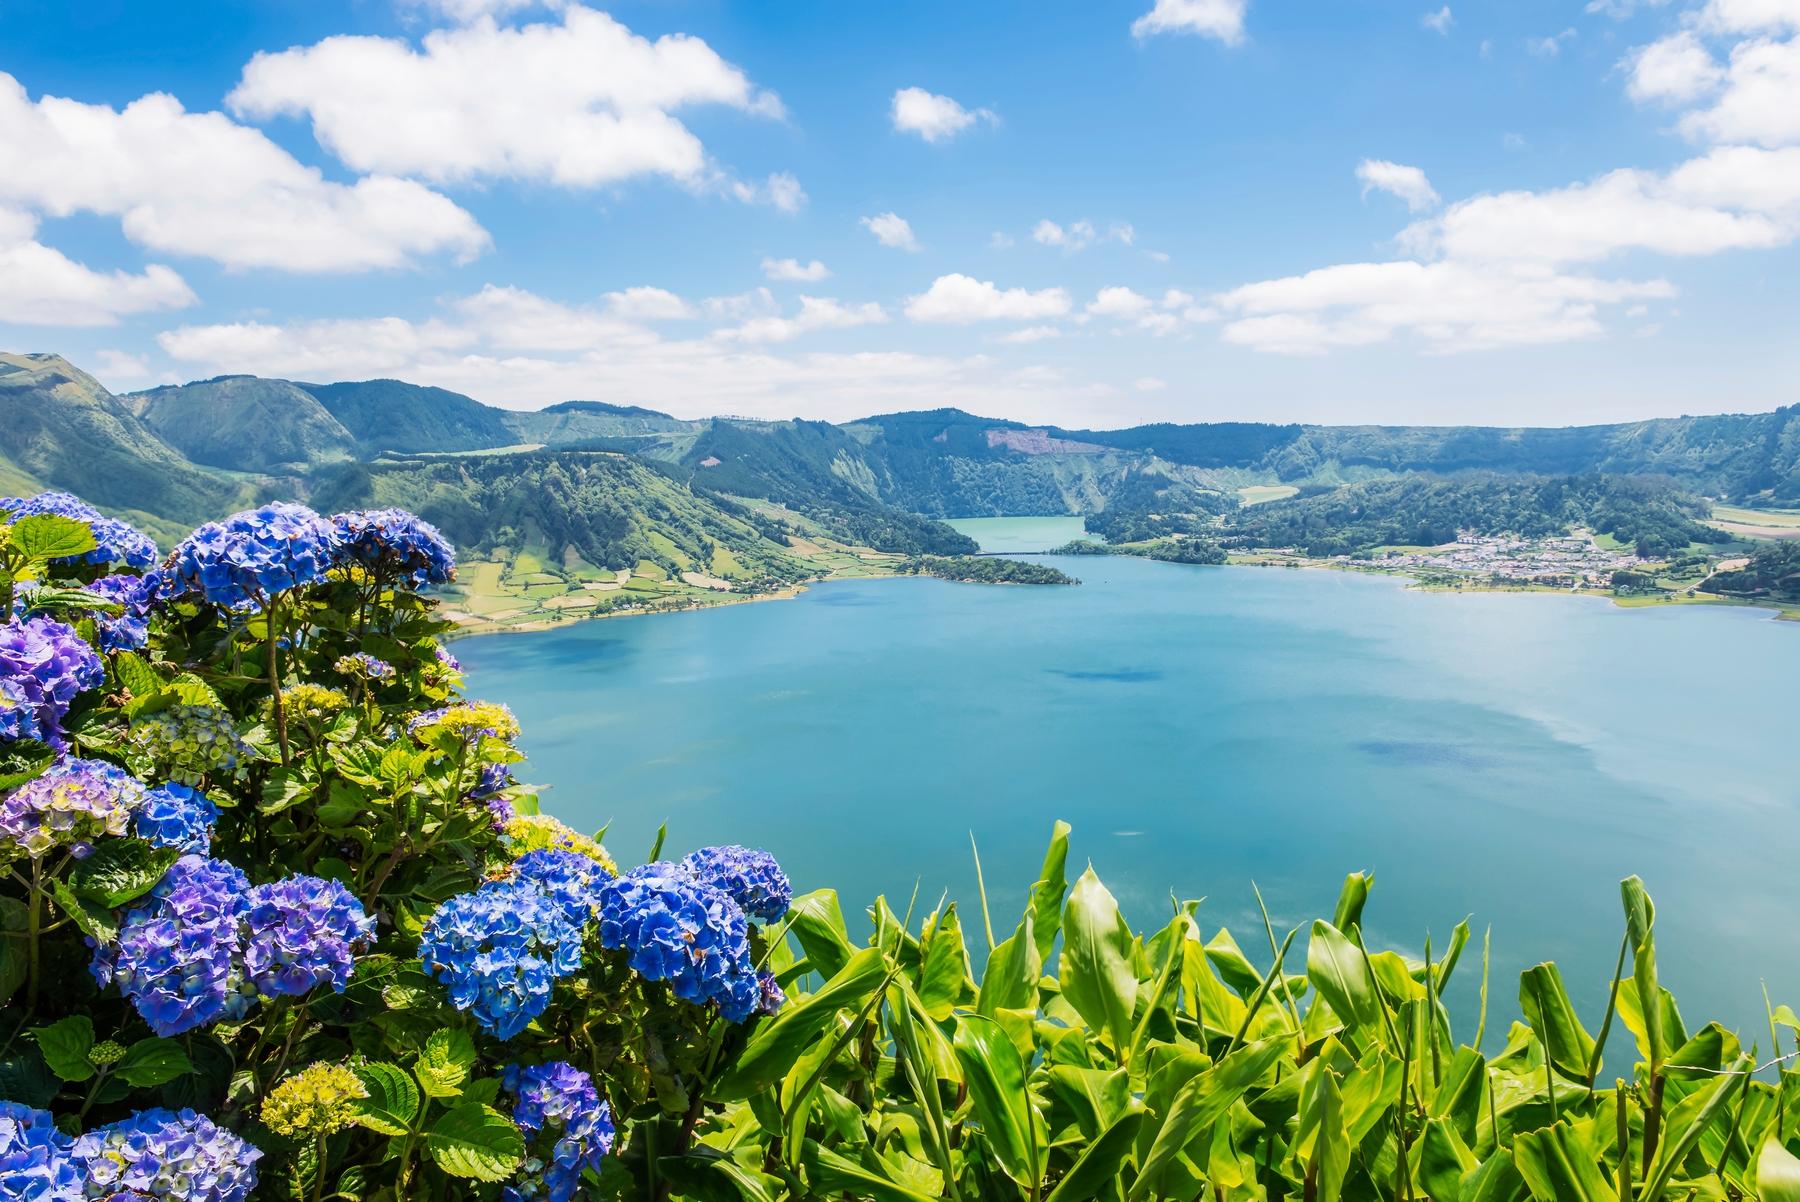 Azores está repleta de rincones encantadores